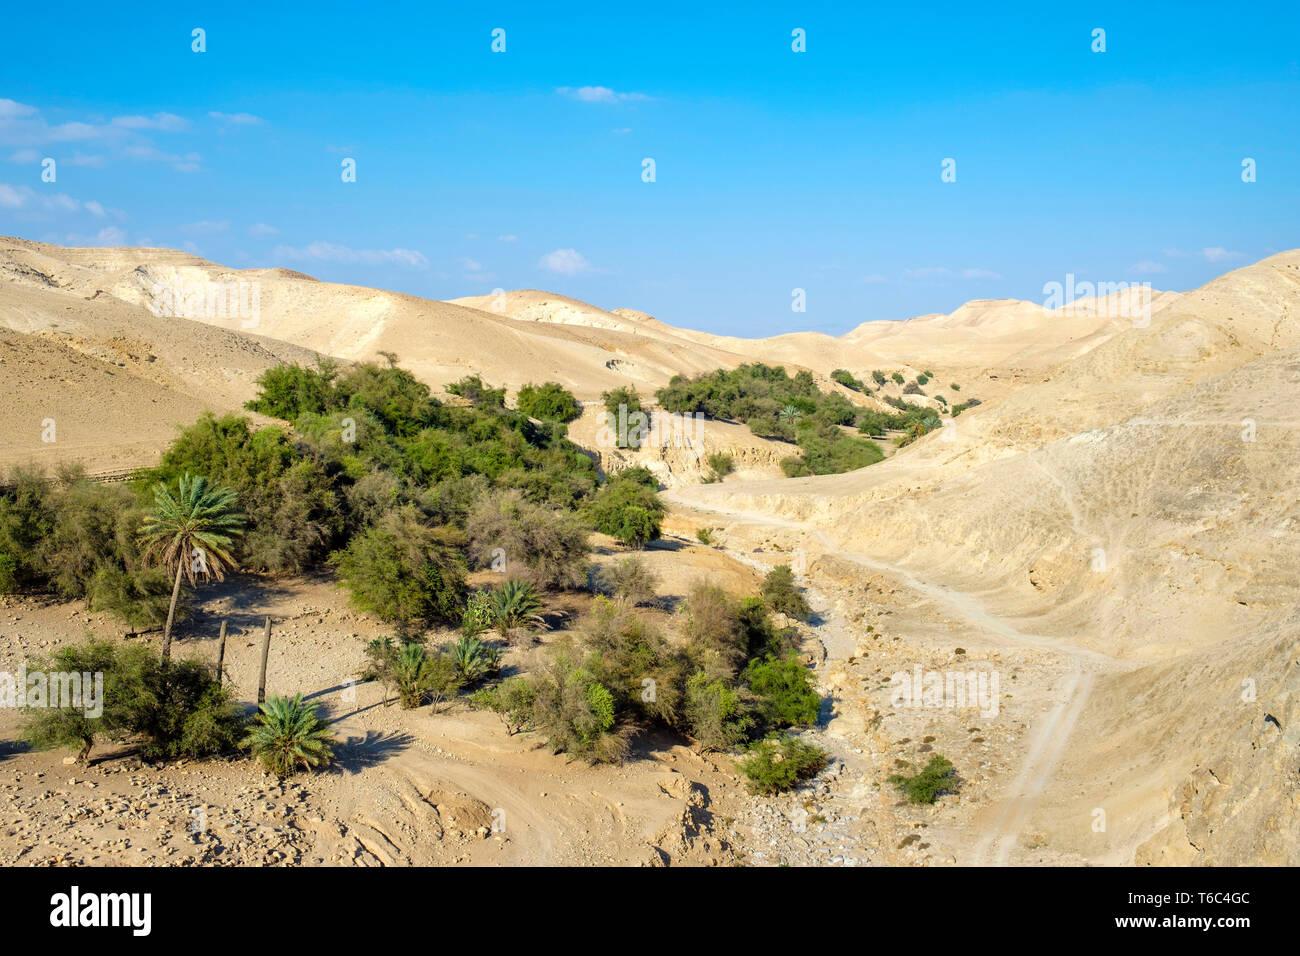 Palestine, West Bank, Jericho. Wadi Quelt, Prat River gorge. - Stock Image